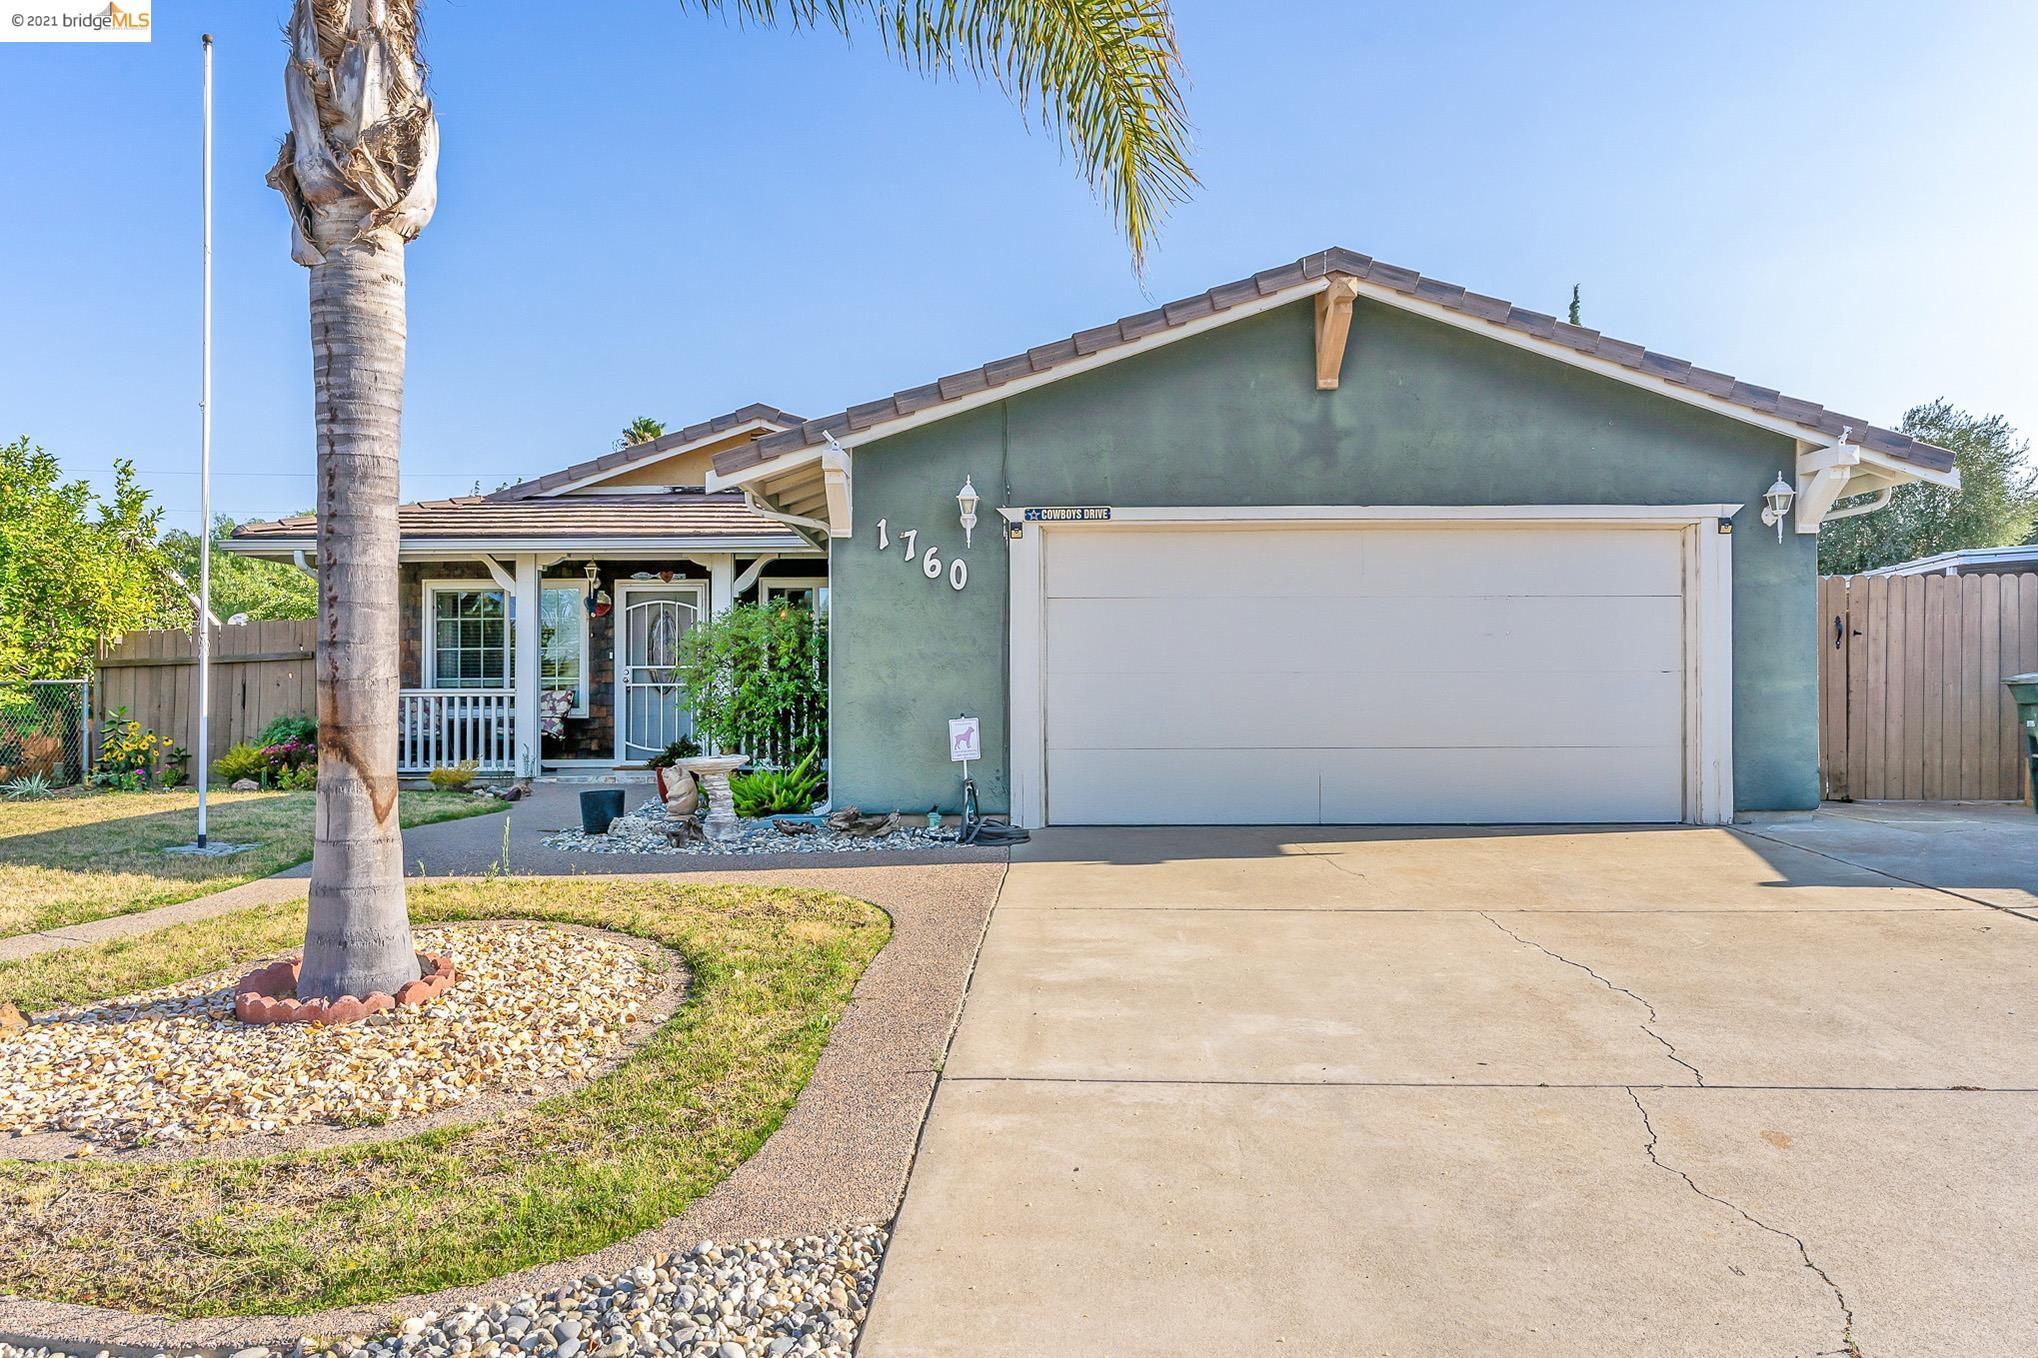 1760 Edgewood, OAKLEY, CA 94561